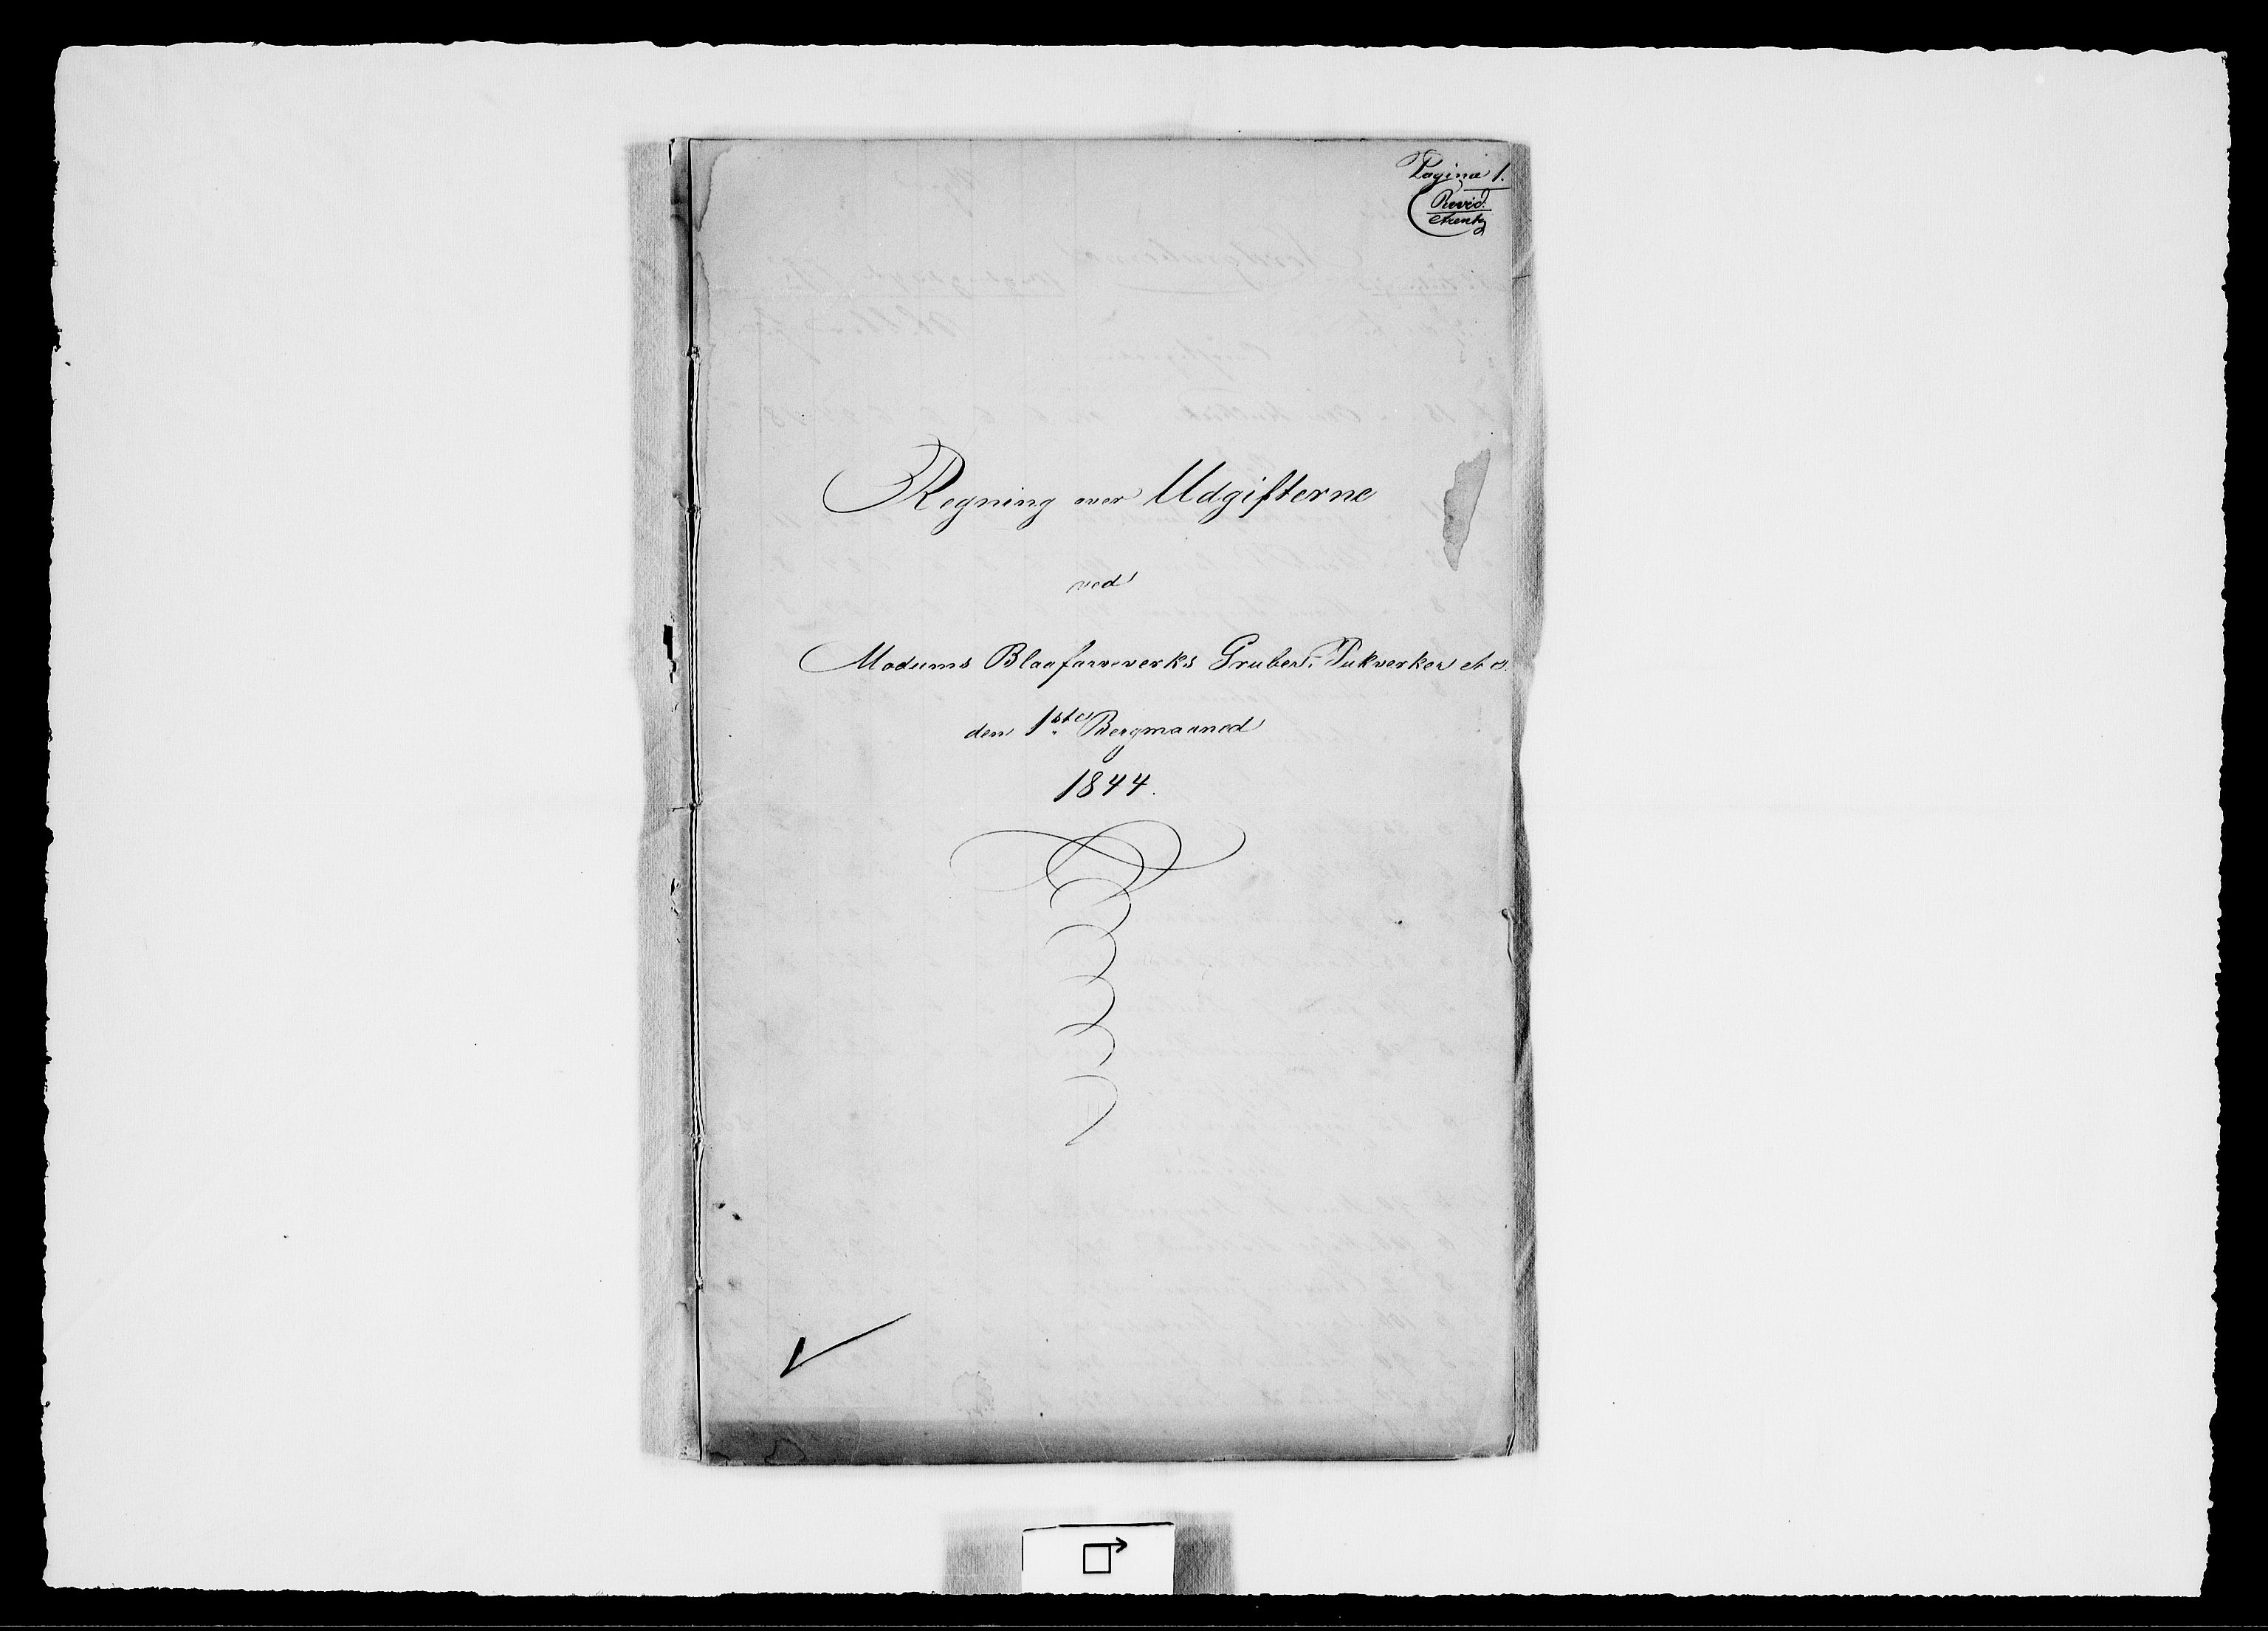 RA, Modums Blaafarveværk, G/Gd/Gdd/L0270, 1844, s. 2